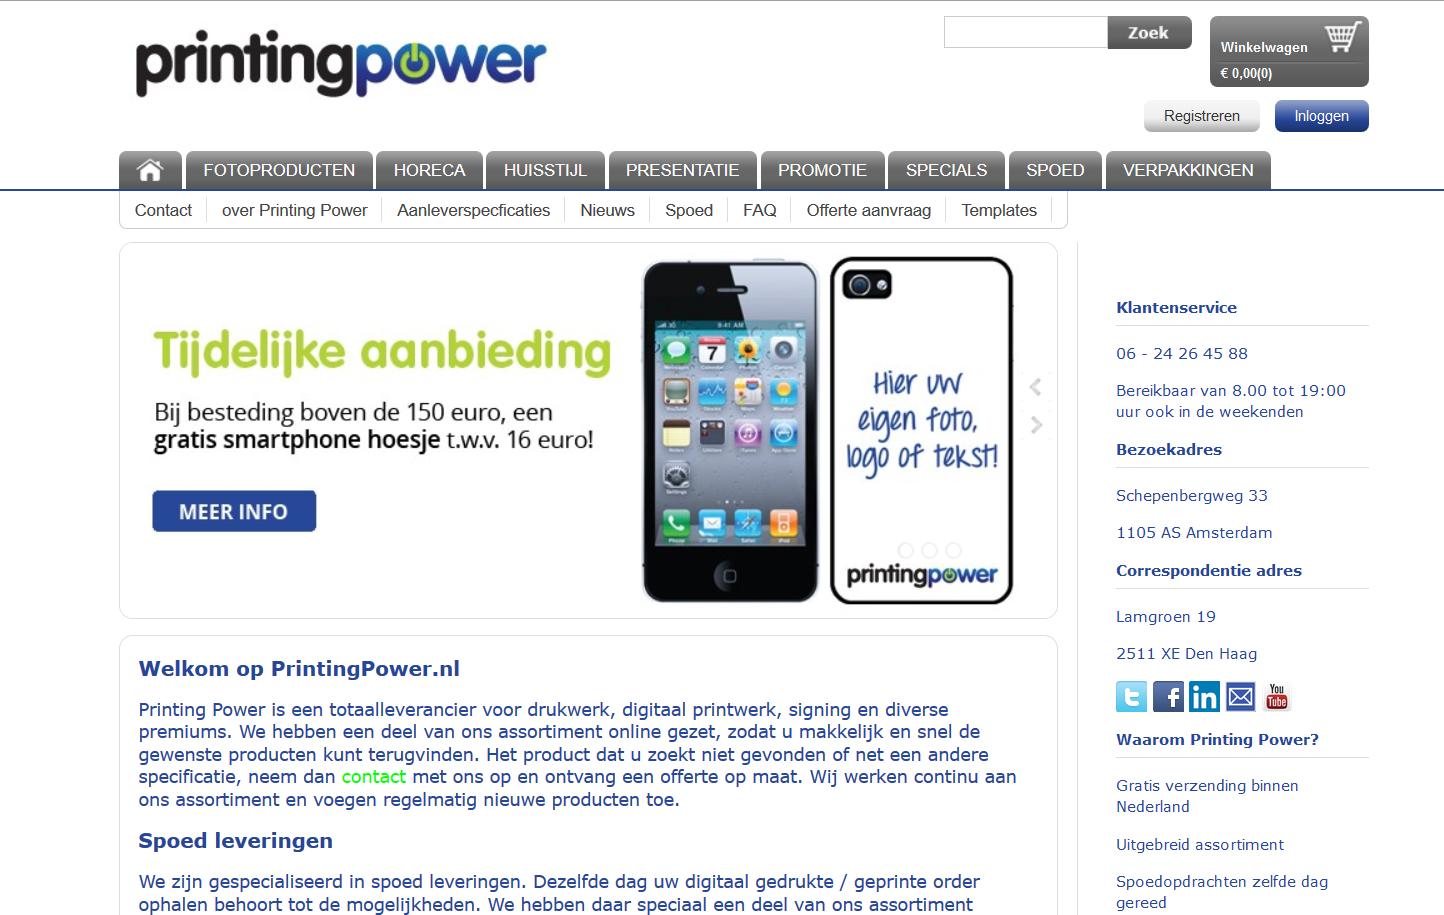 www.printingpower.nl